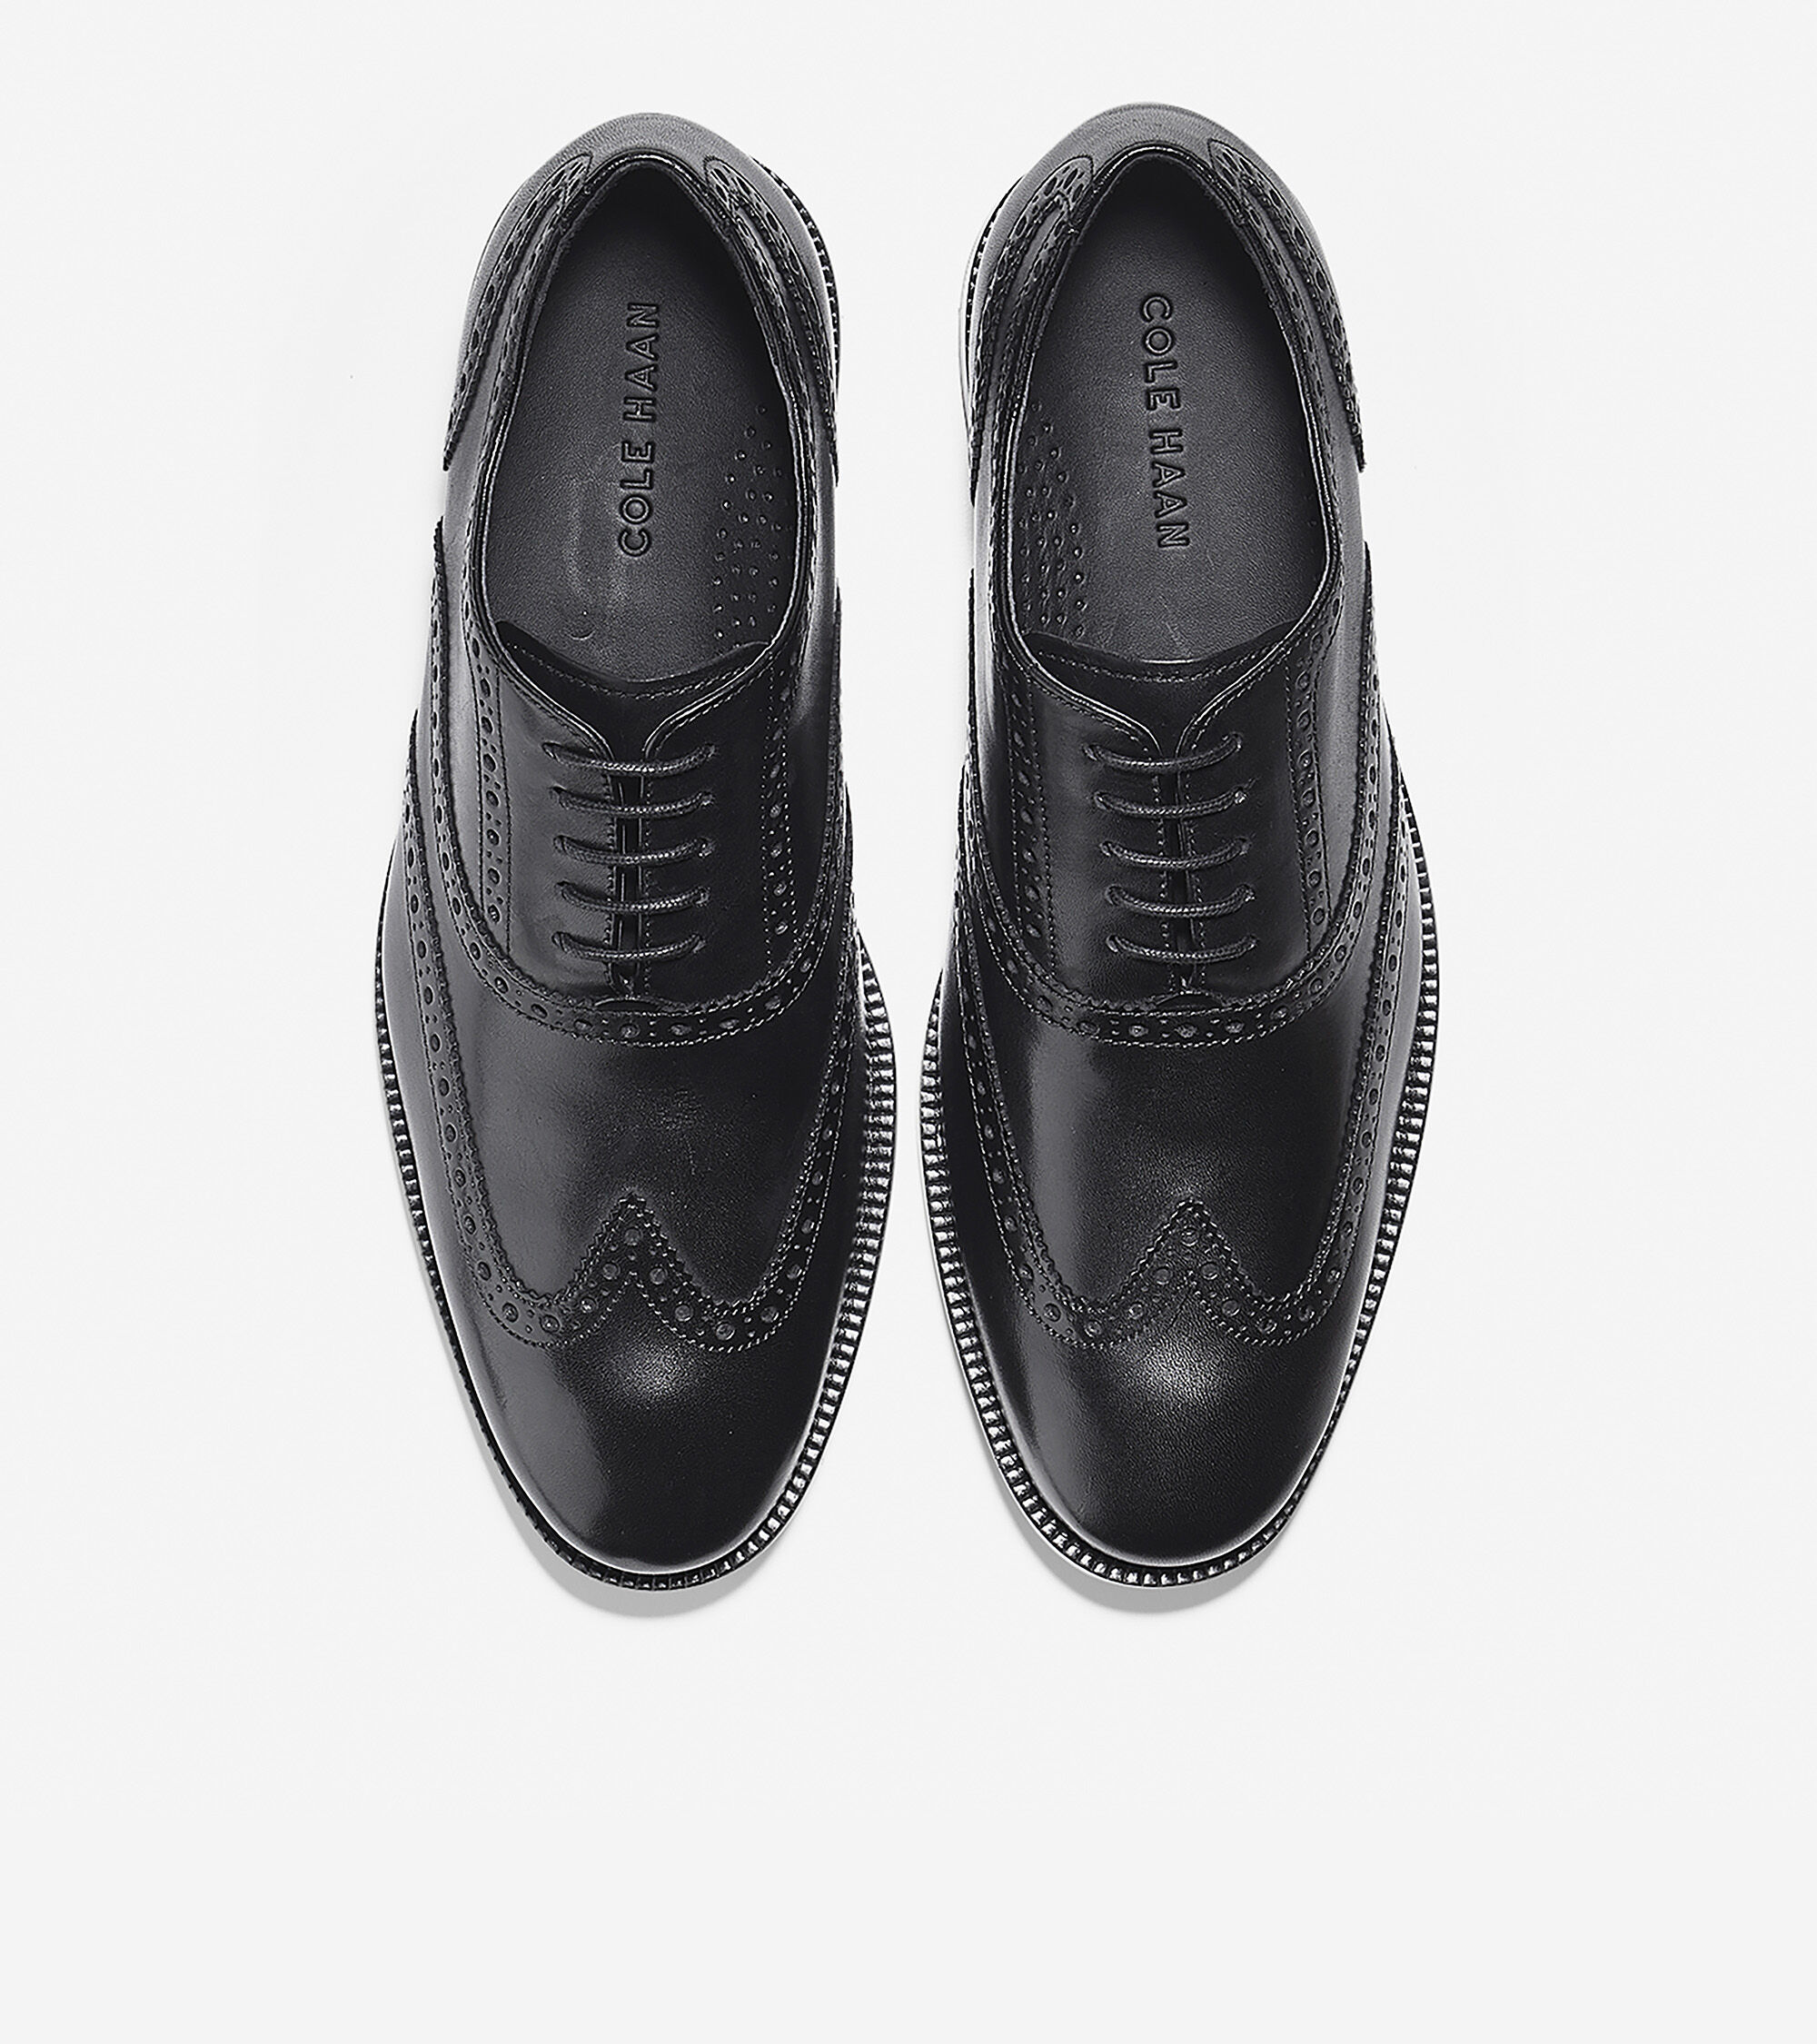 Men's Williams Wingtip Oxford in Black